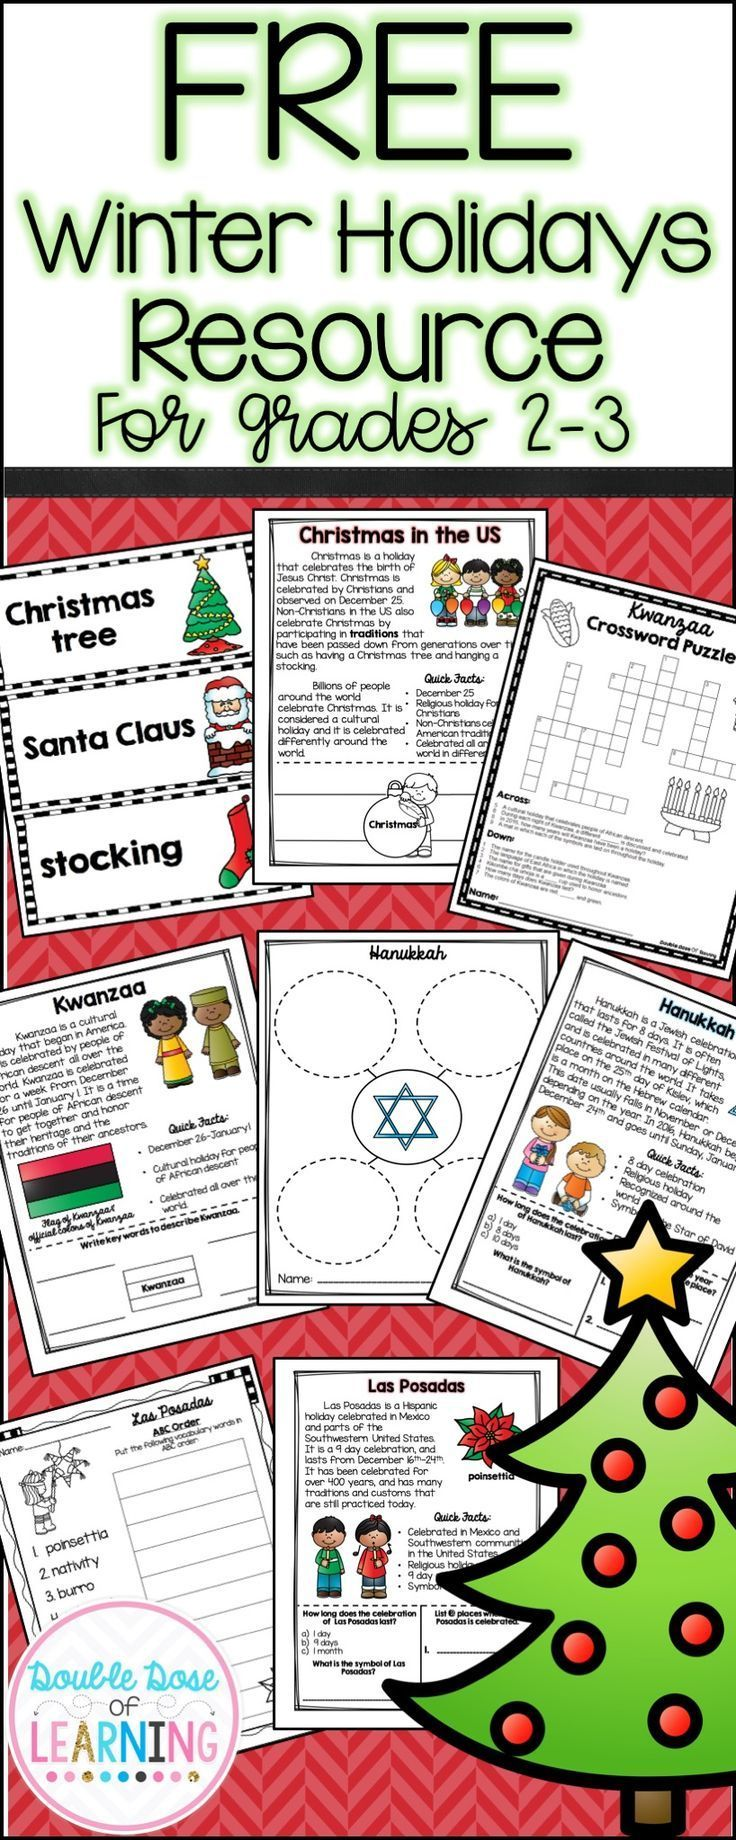 Workbooks las posadas worksheets : Free Winter Holidays resource for grades 2-3. Christmas, Kwanzaa ...